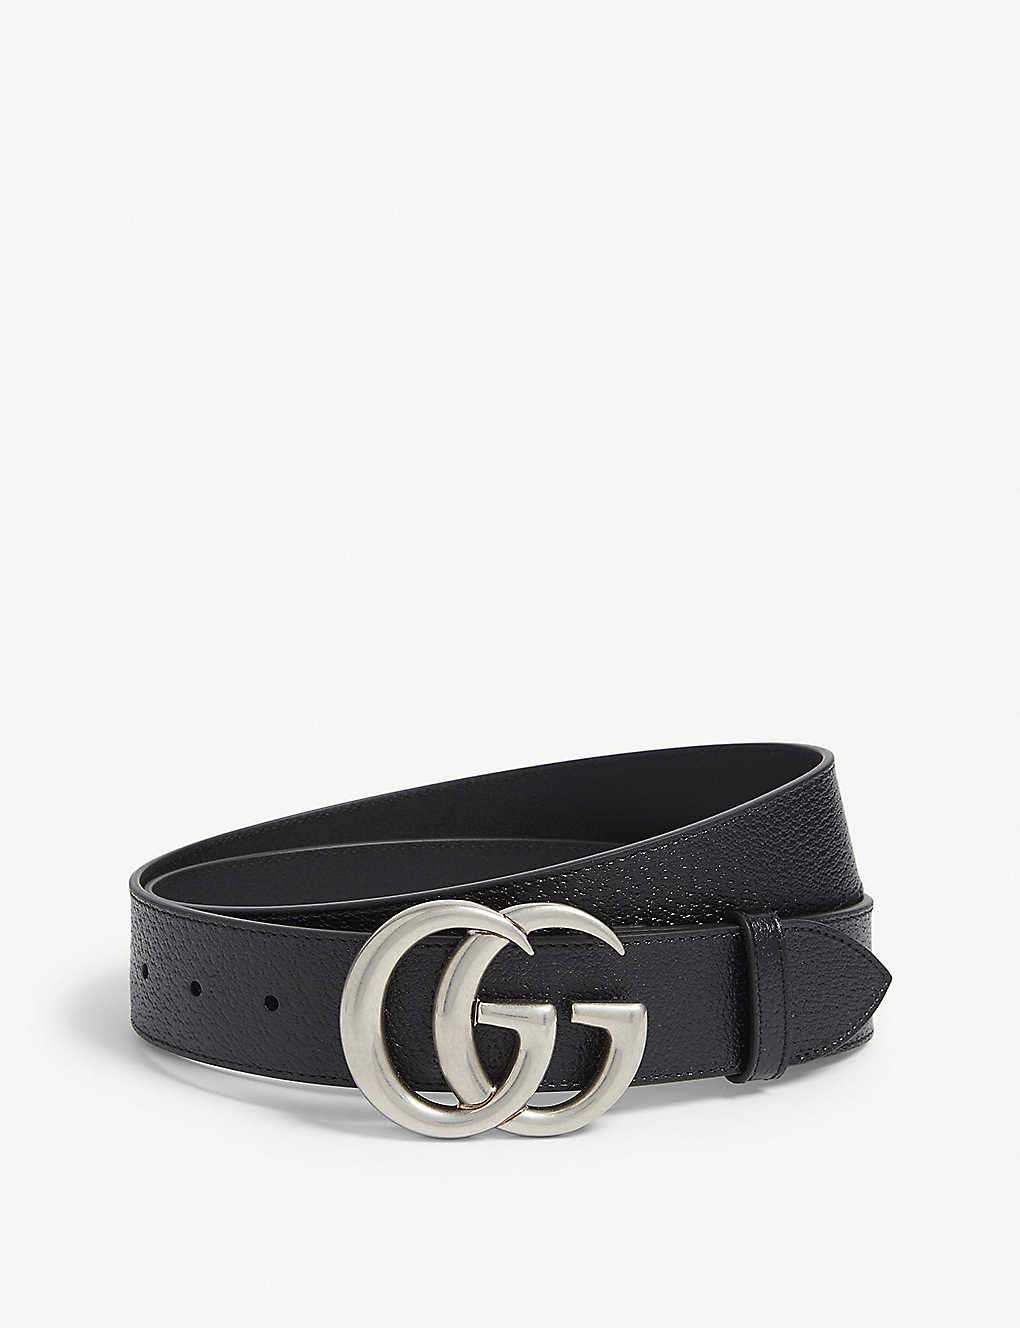 50dc48921 GUCCI - GG logo leather and suede belt | Selfridges.com